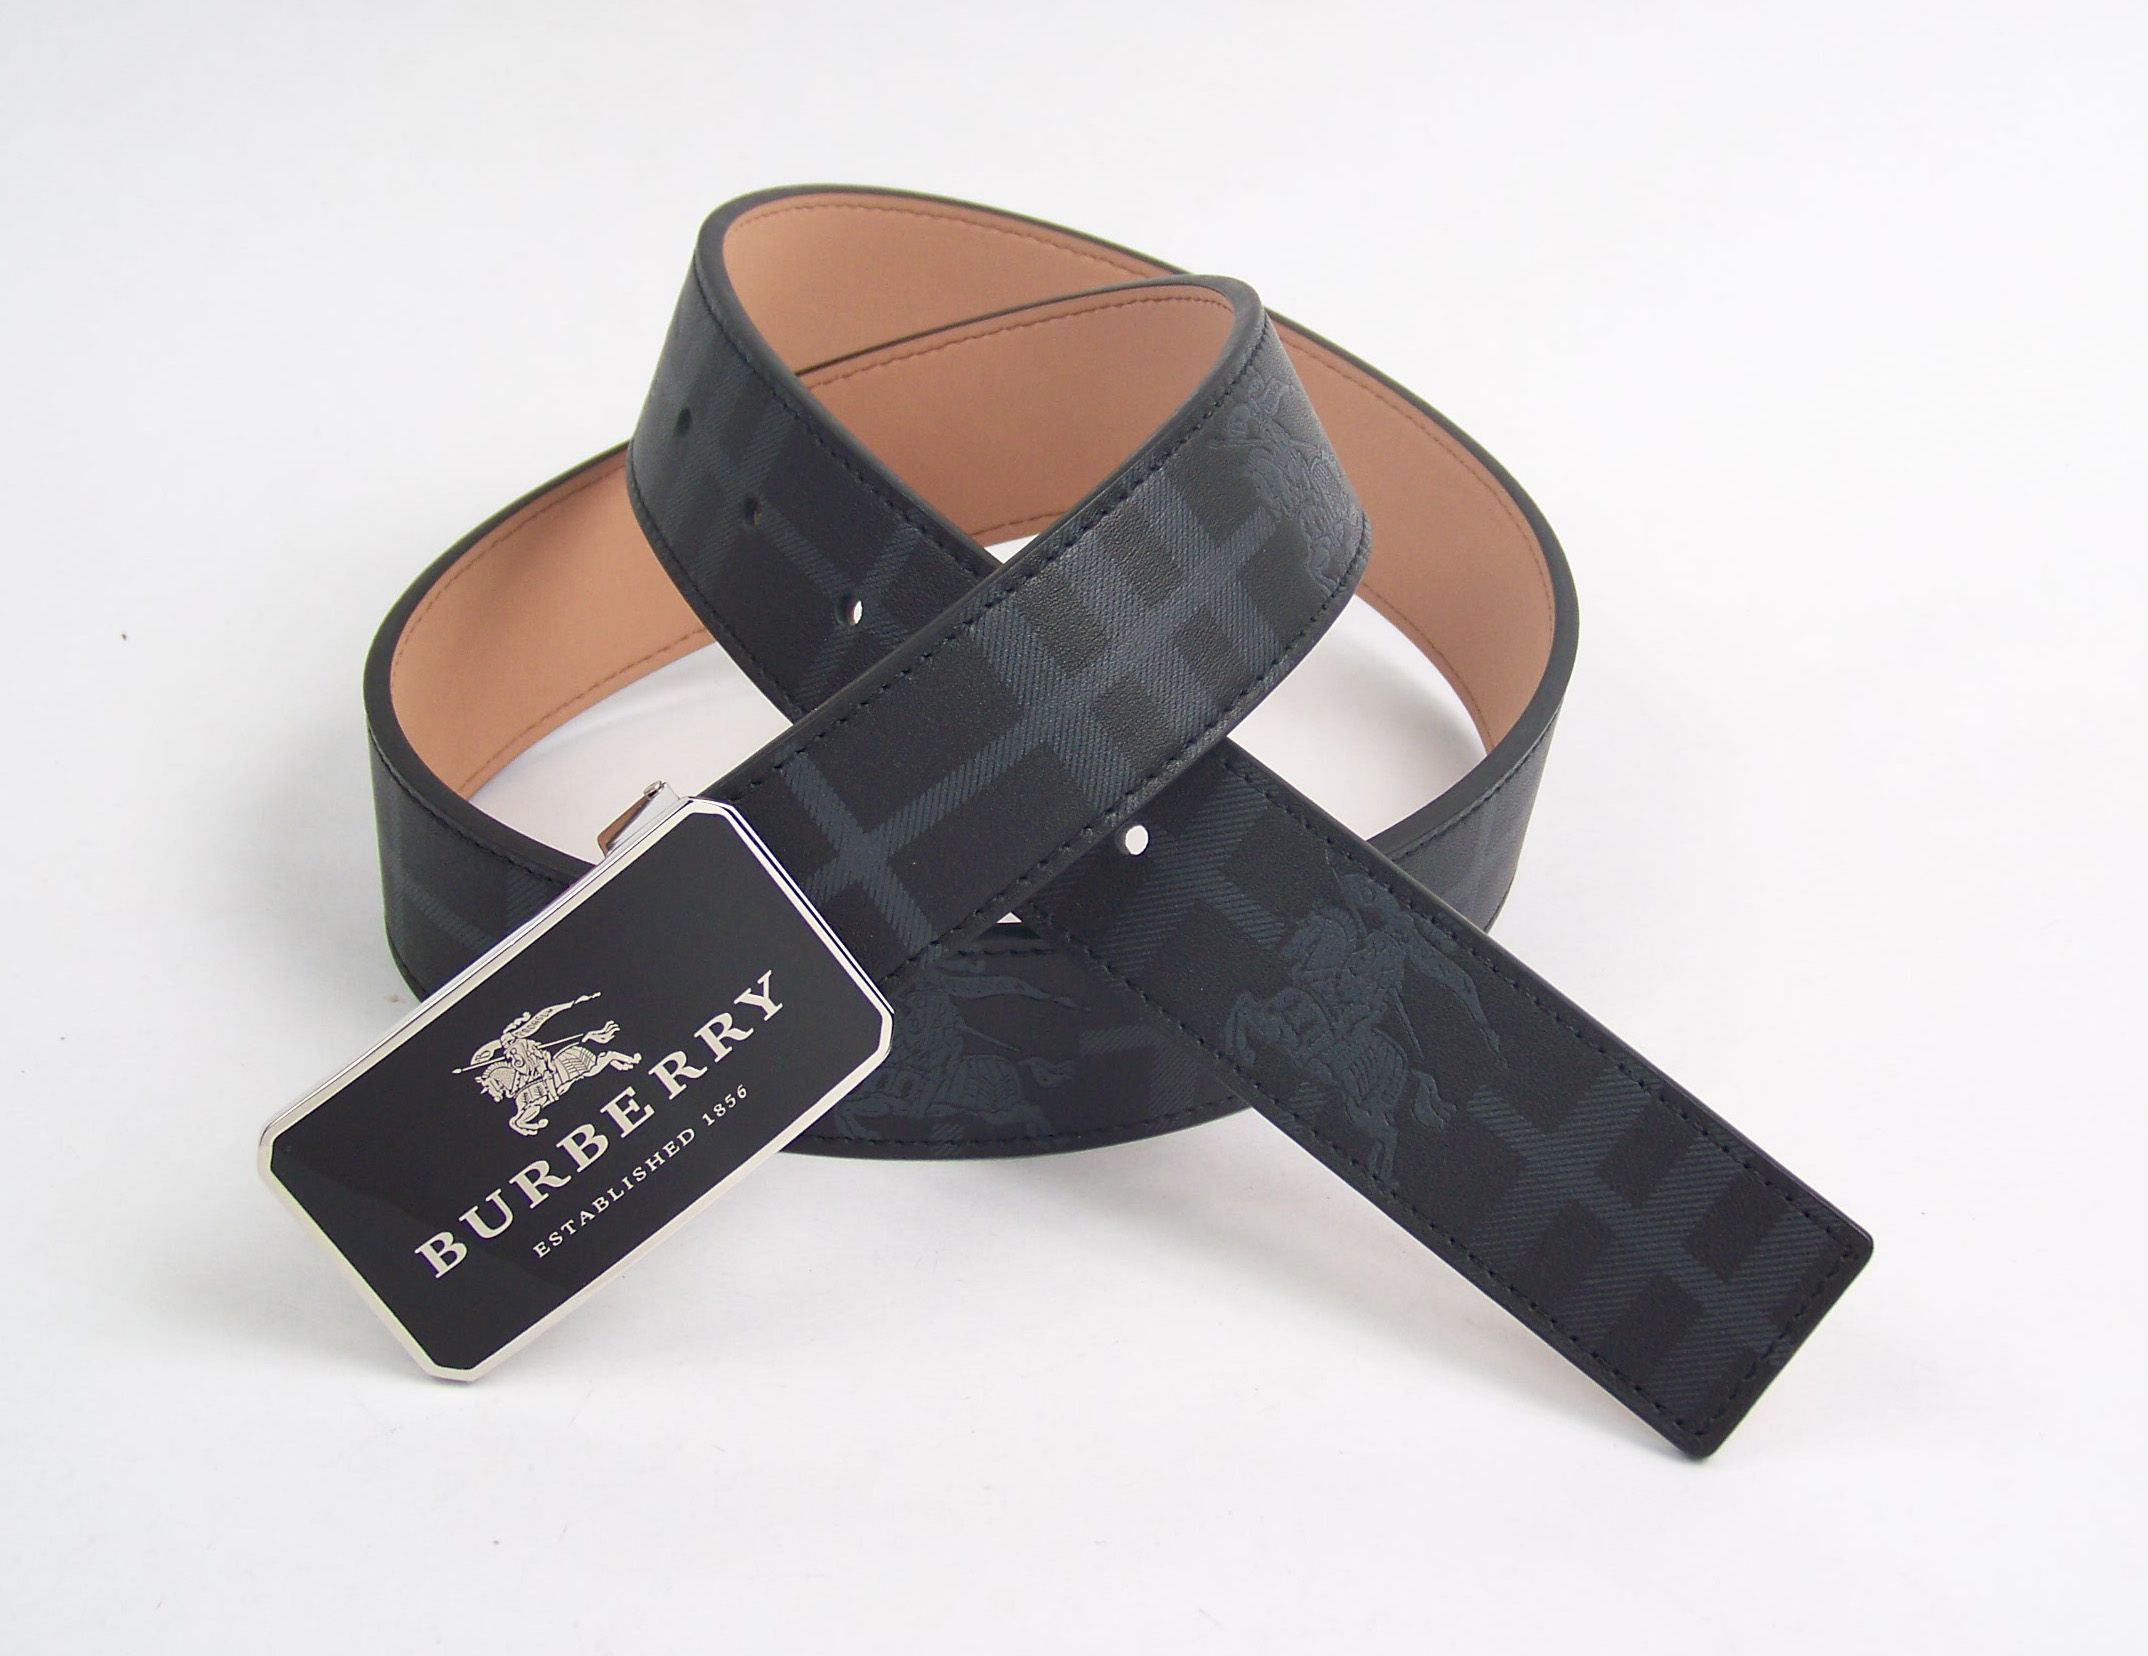 0d974654f35d Used Burberry Men s Belts   Men s Belts   Burberry mens belt ...